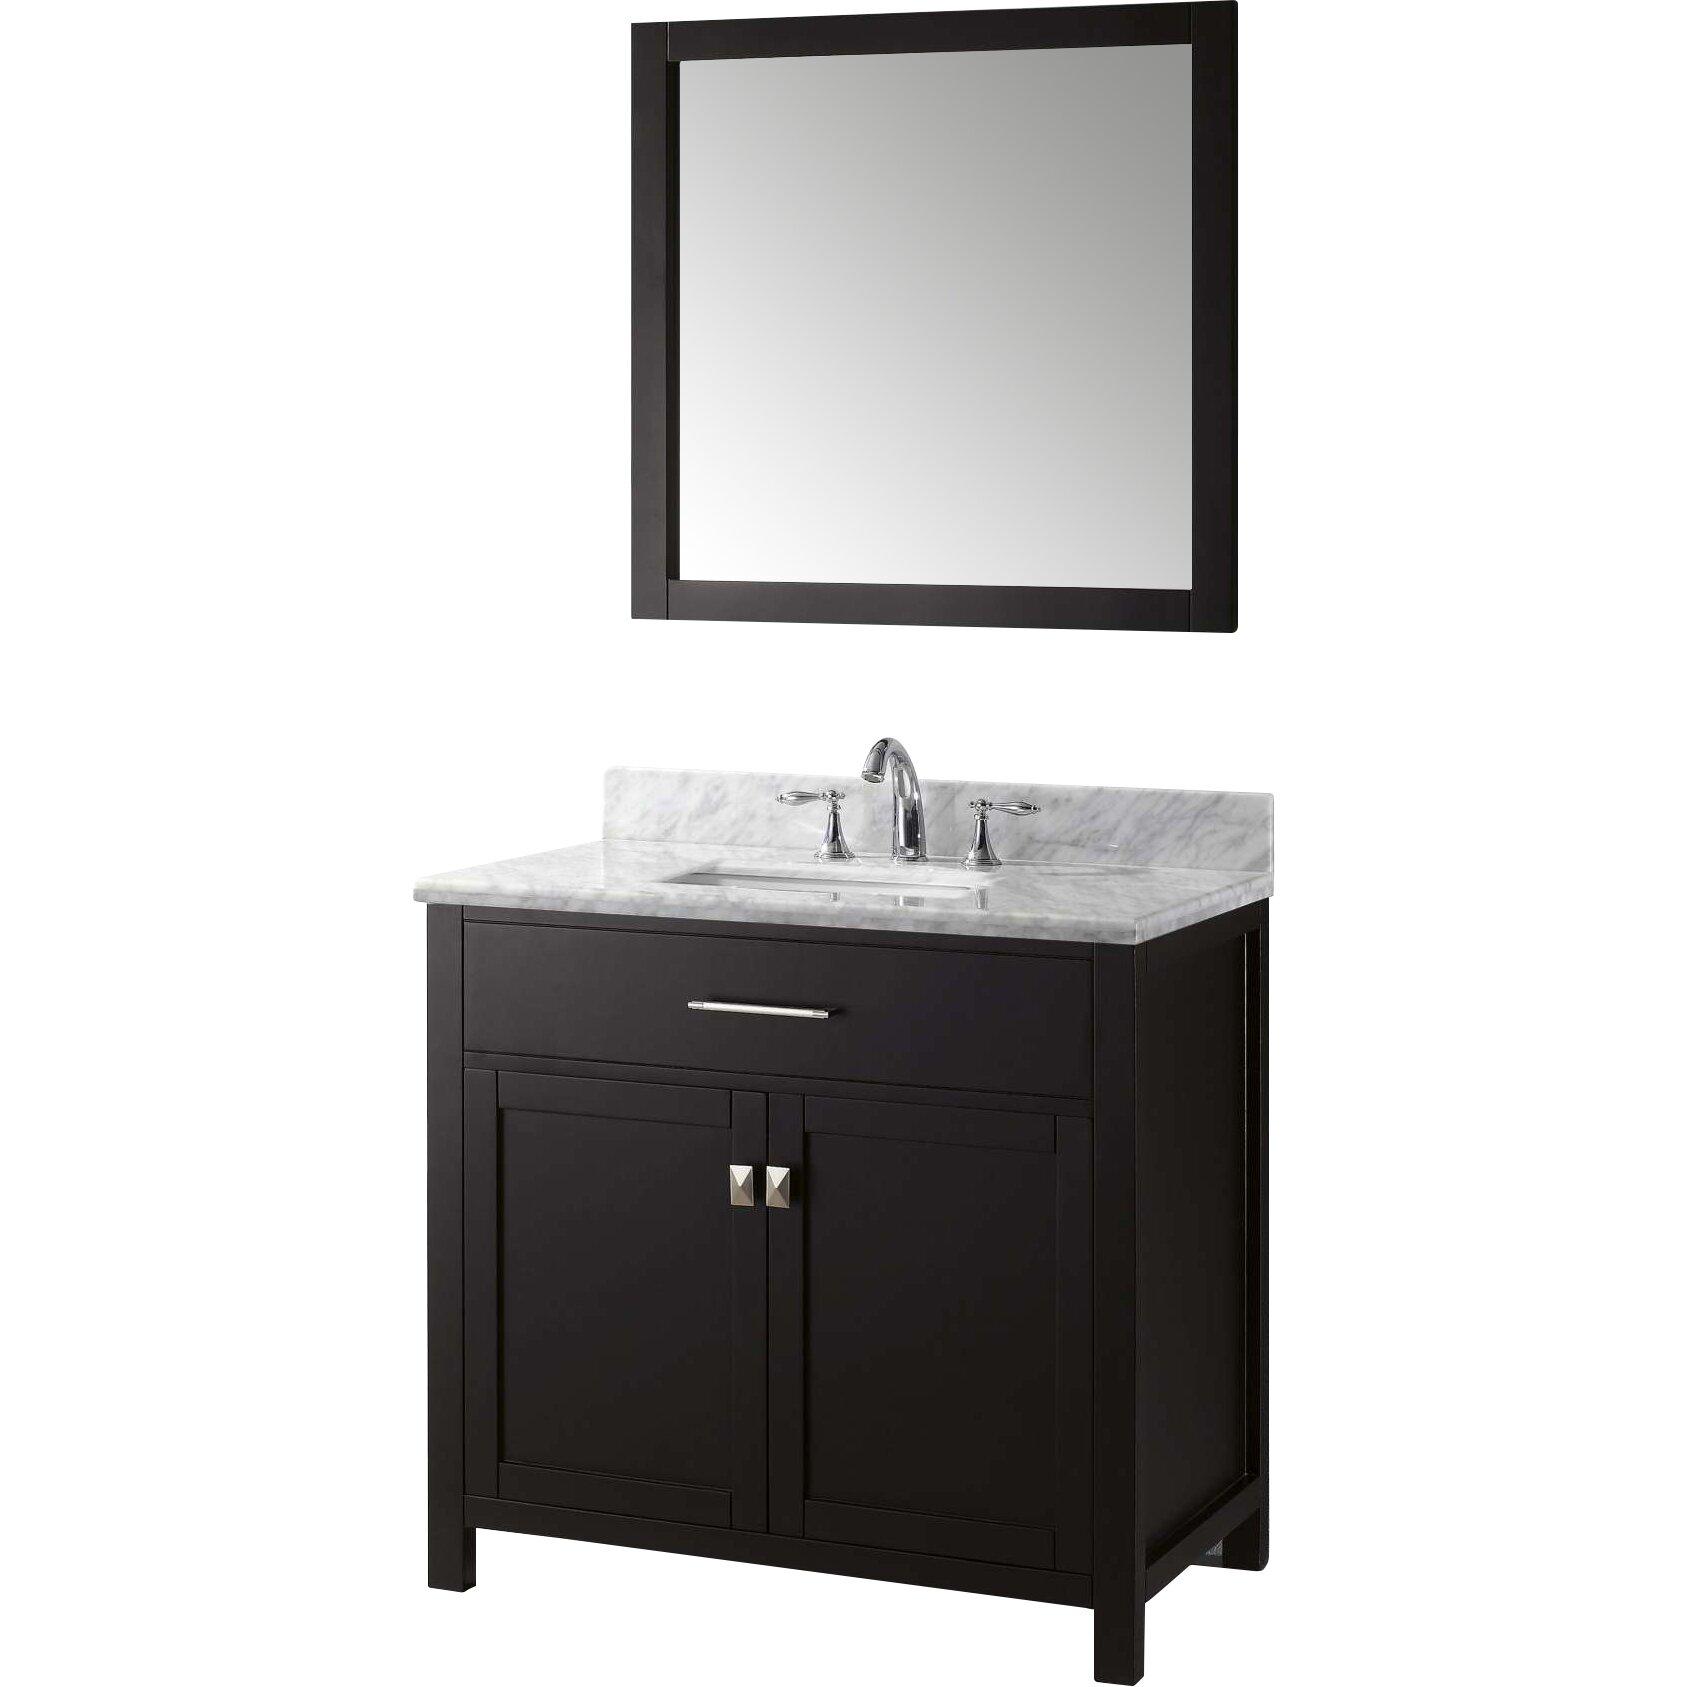 Virtu caroline 36 single bathroom vanity set with carrara for Vanity and mirror set